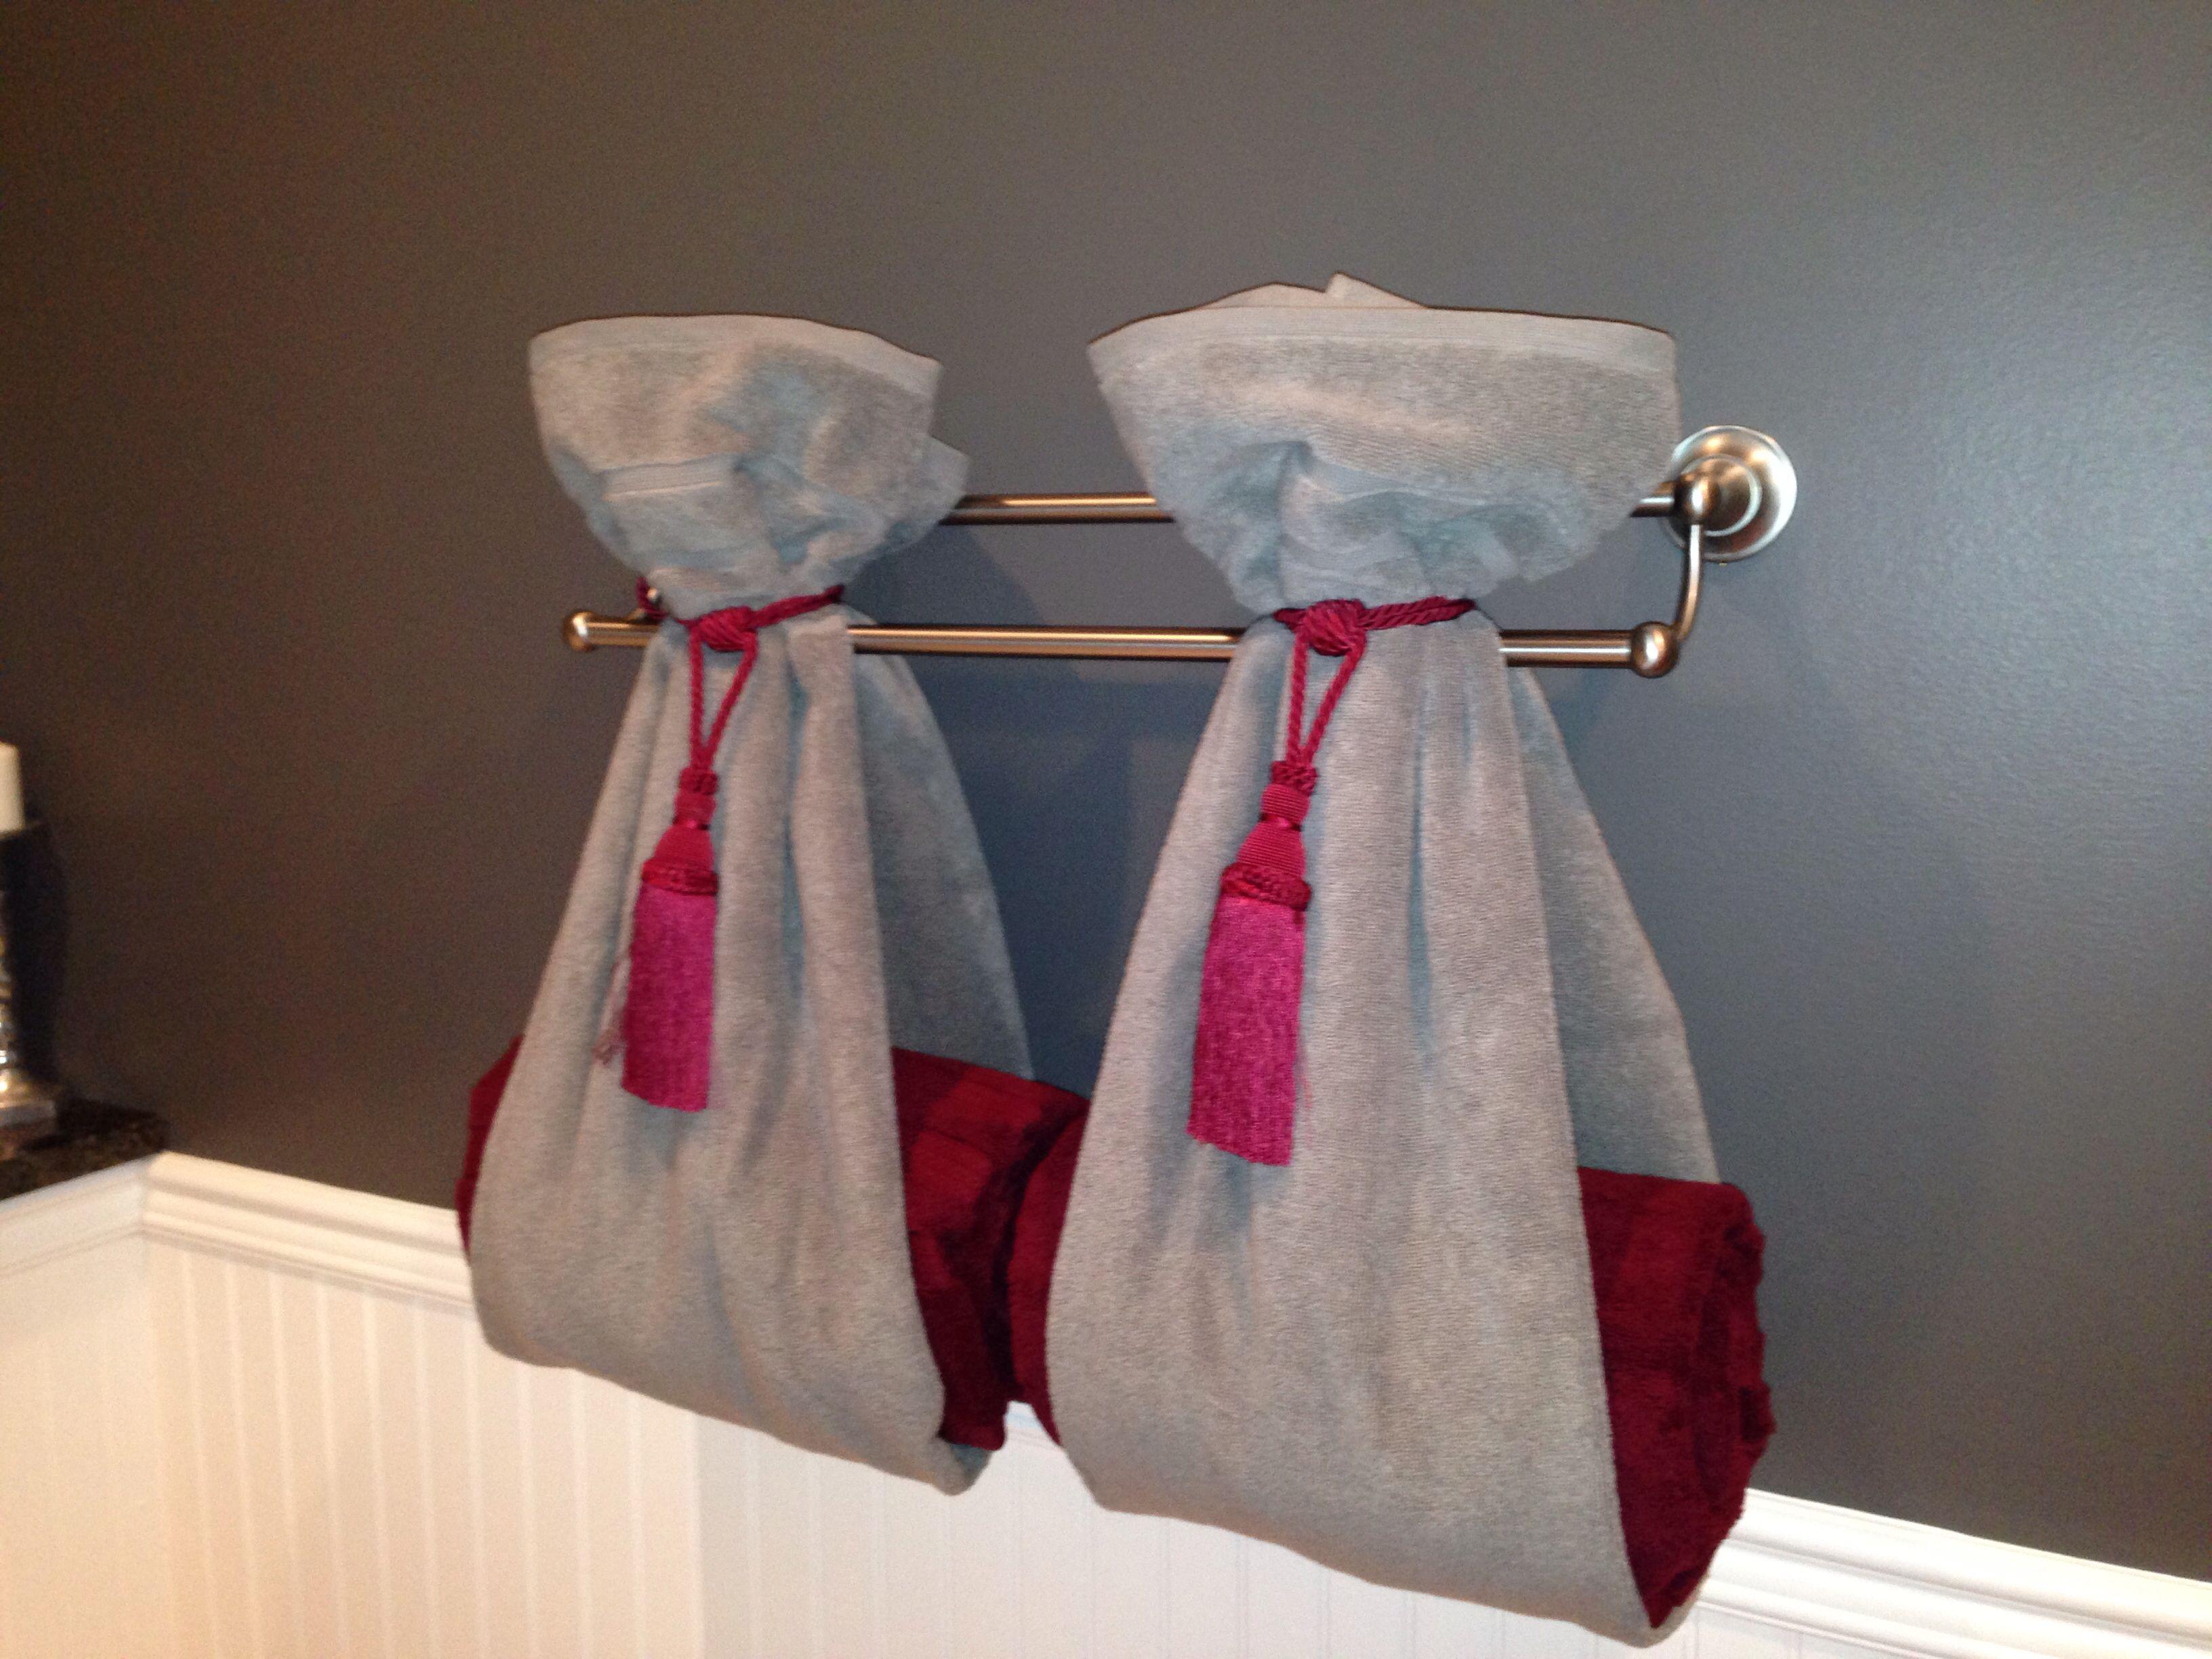 A Different Way To Hang Towels Using Curtain Tie Backs Decorative Towels Bathroom Towel Decor Hanging Bath Towels